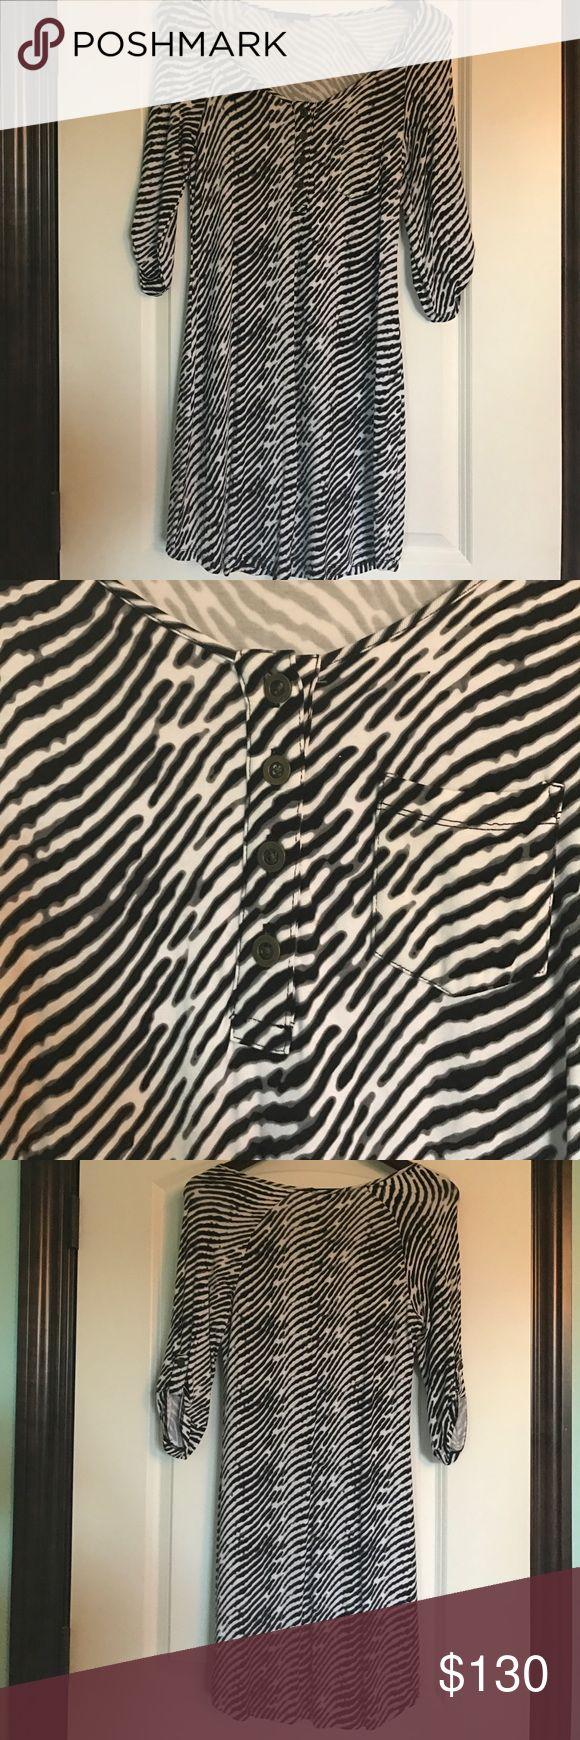 Tart Zebra Print Dress Zebra Print daytime dress in great condition. Comfortable fabric; easy to work in. Dresses Midi